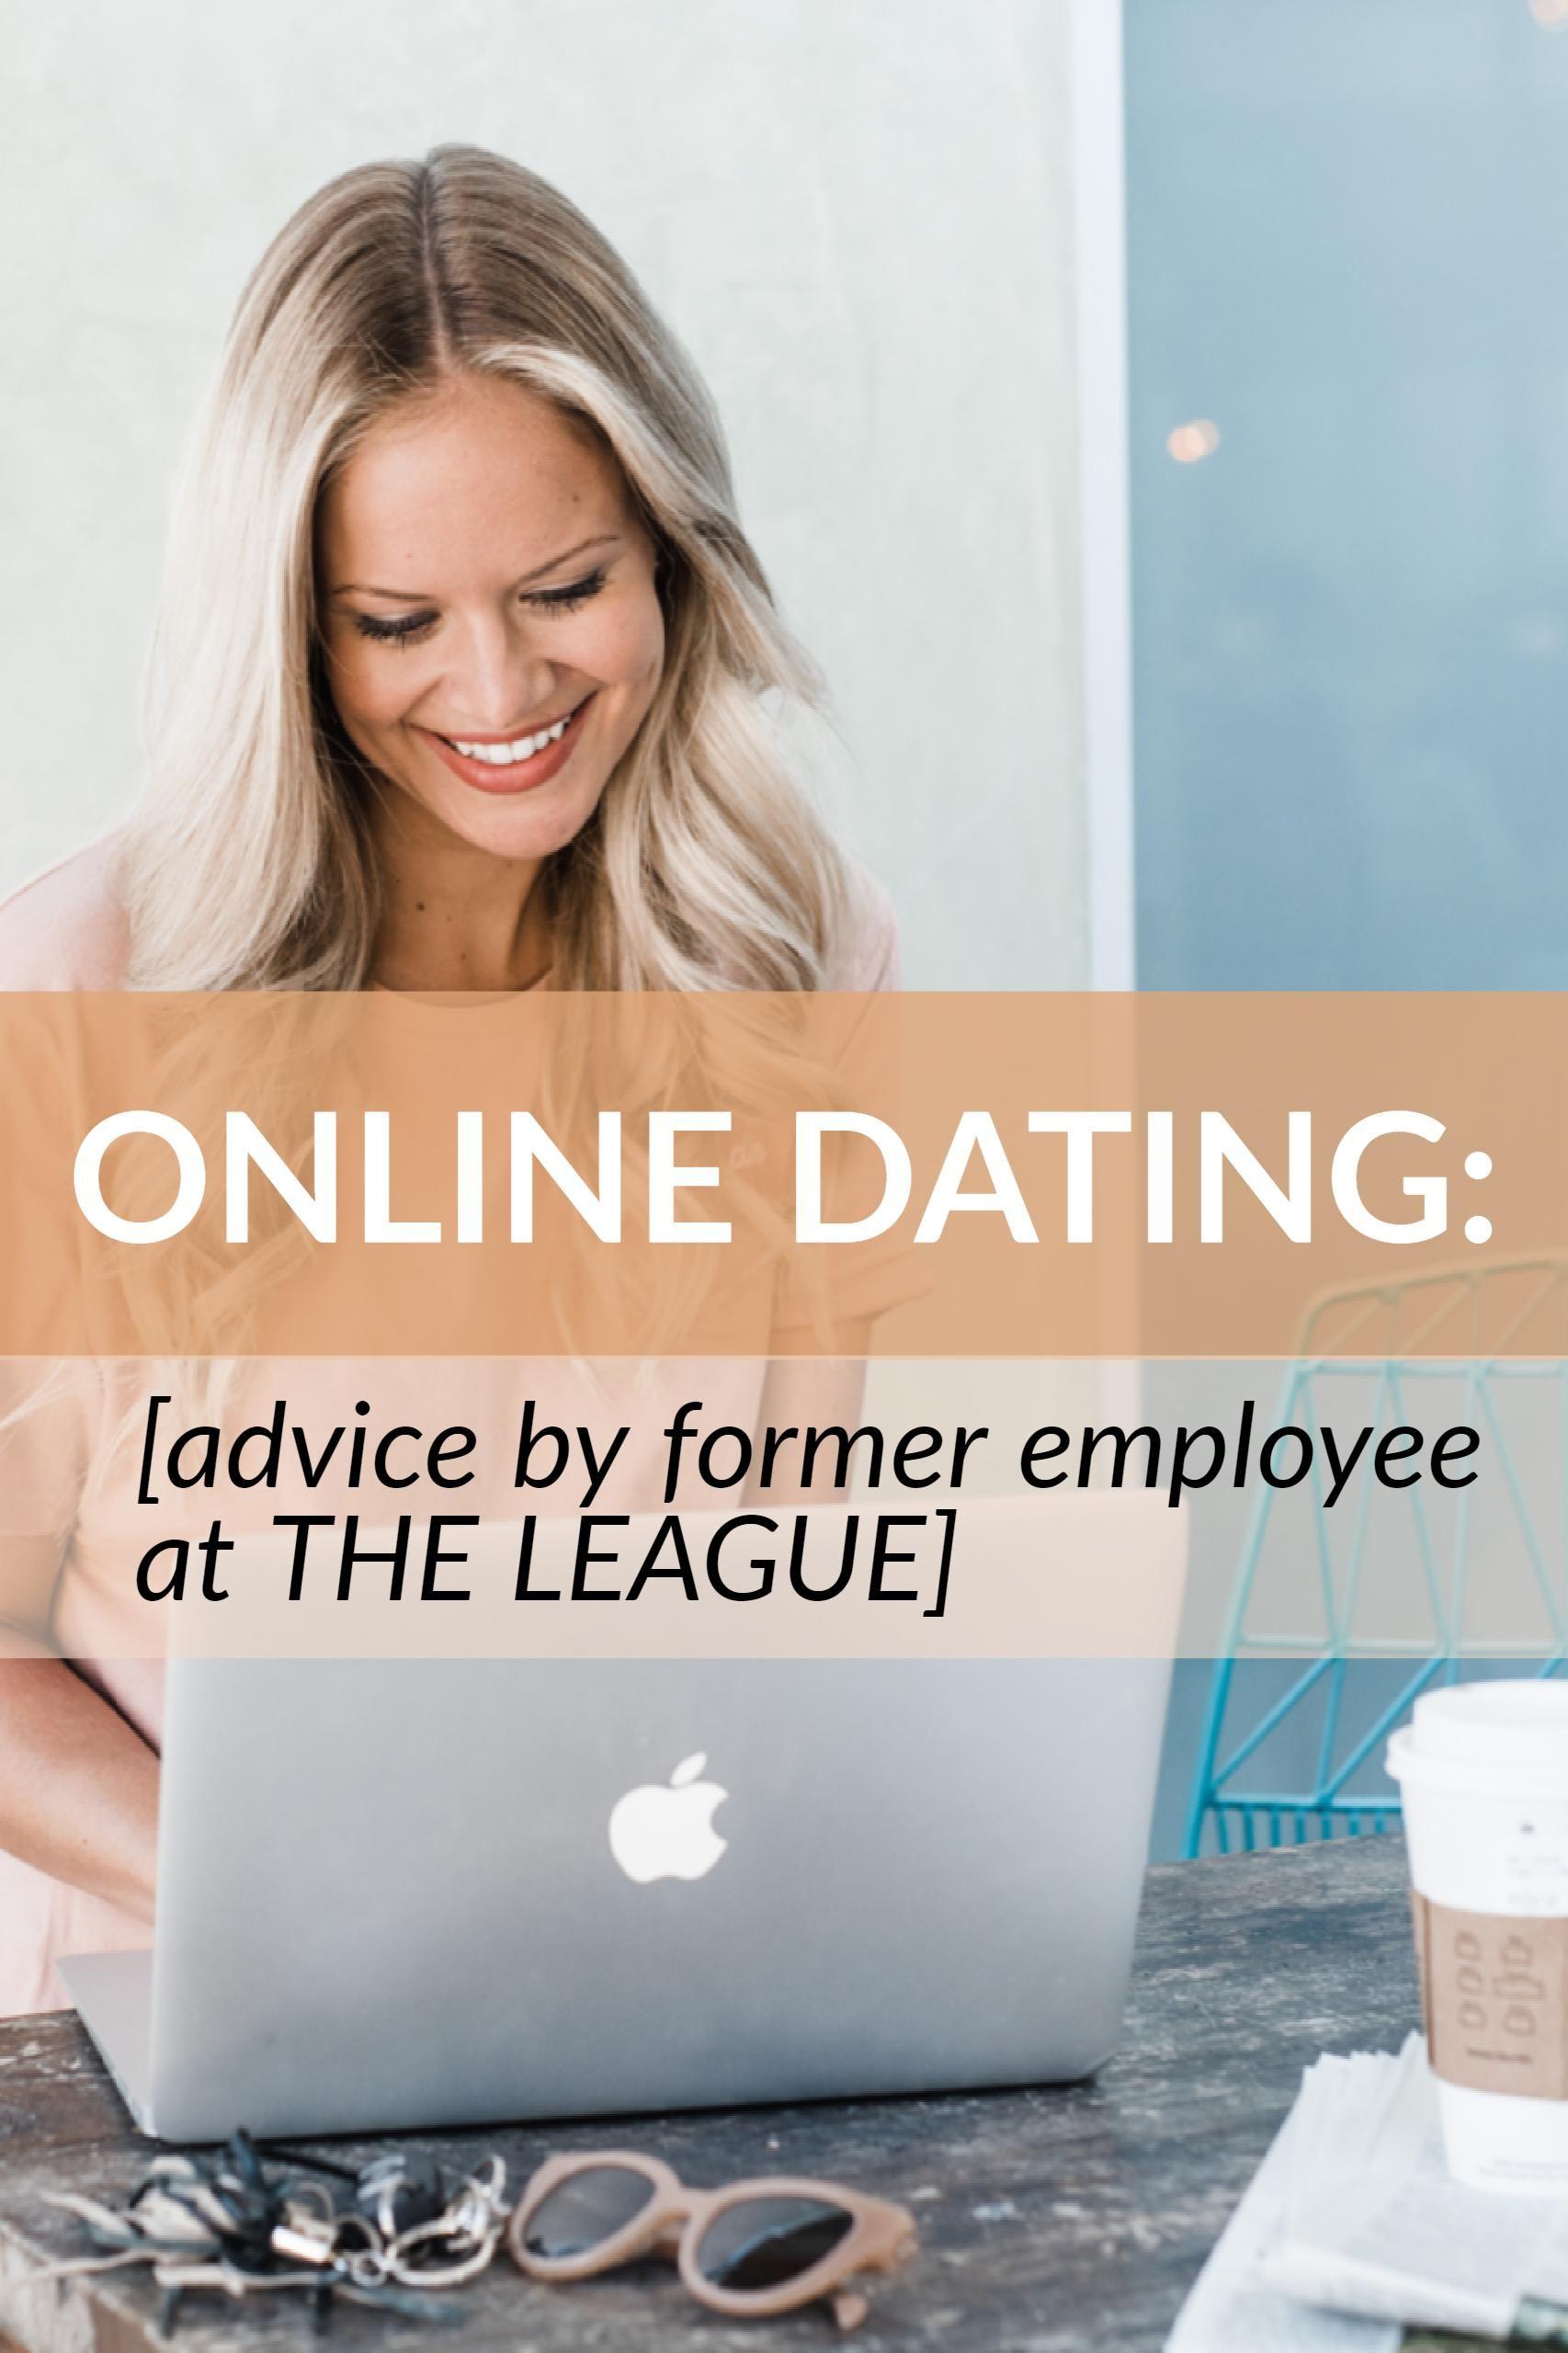 League online dating